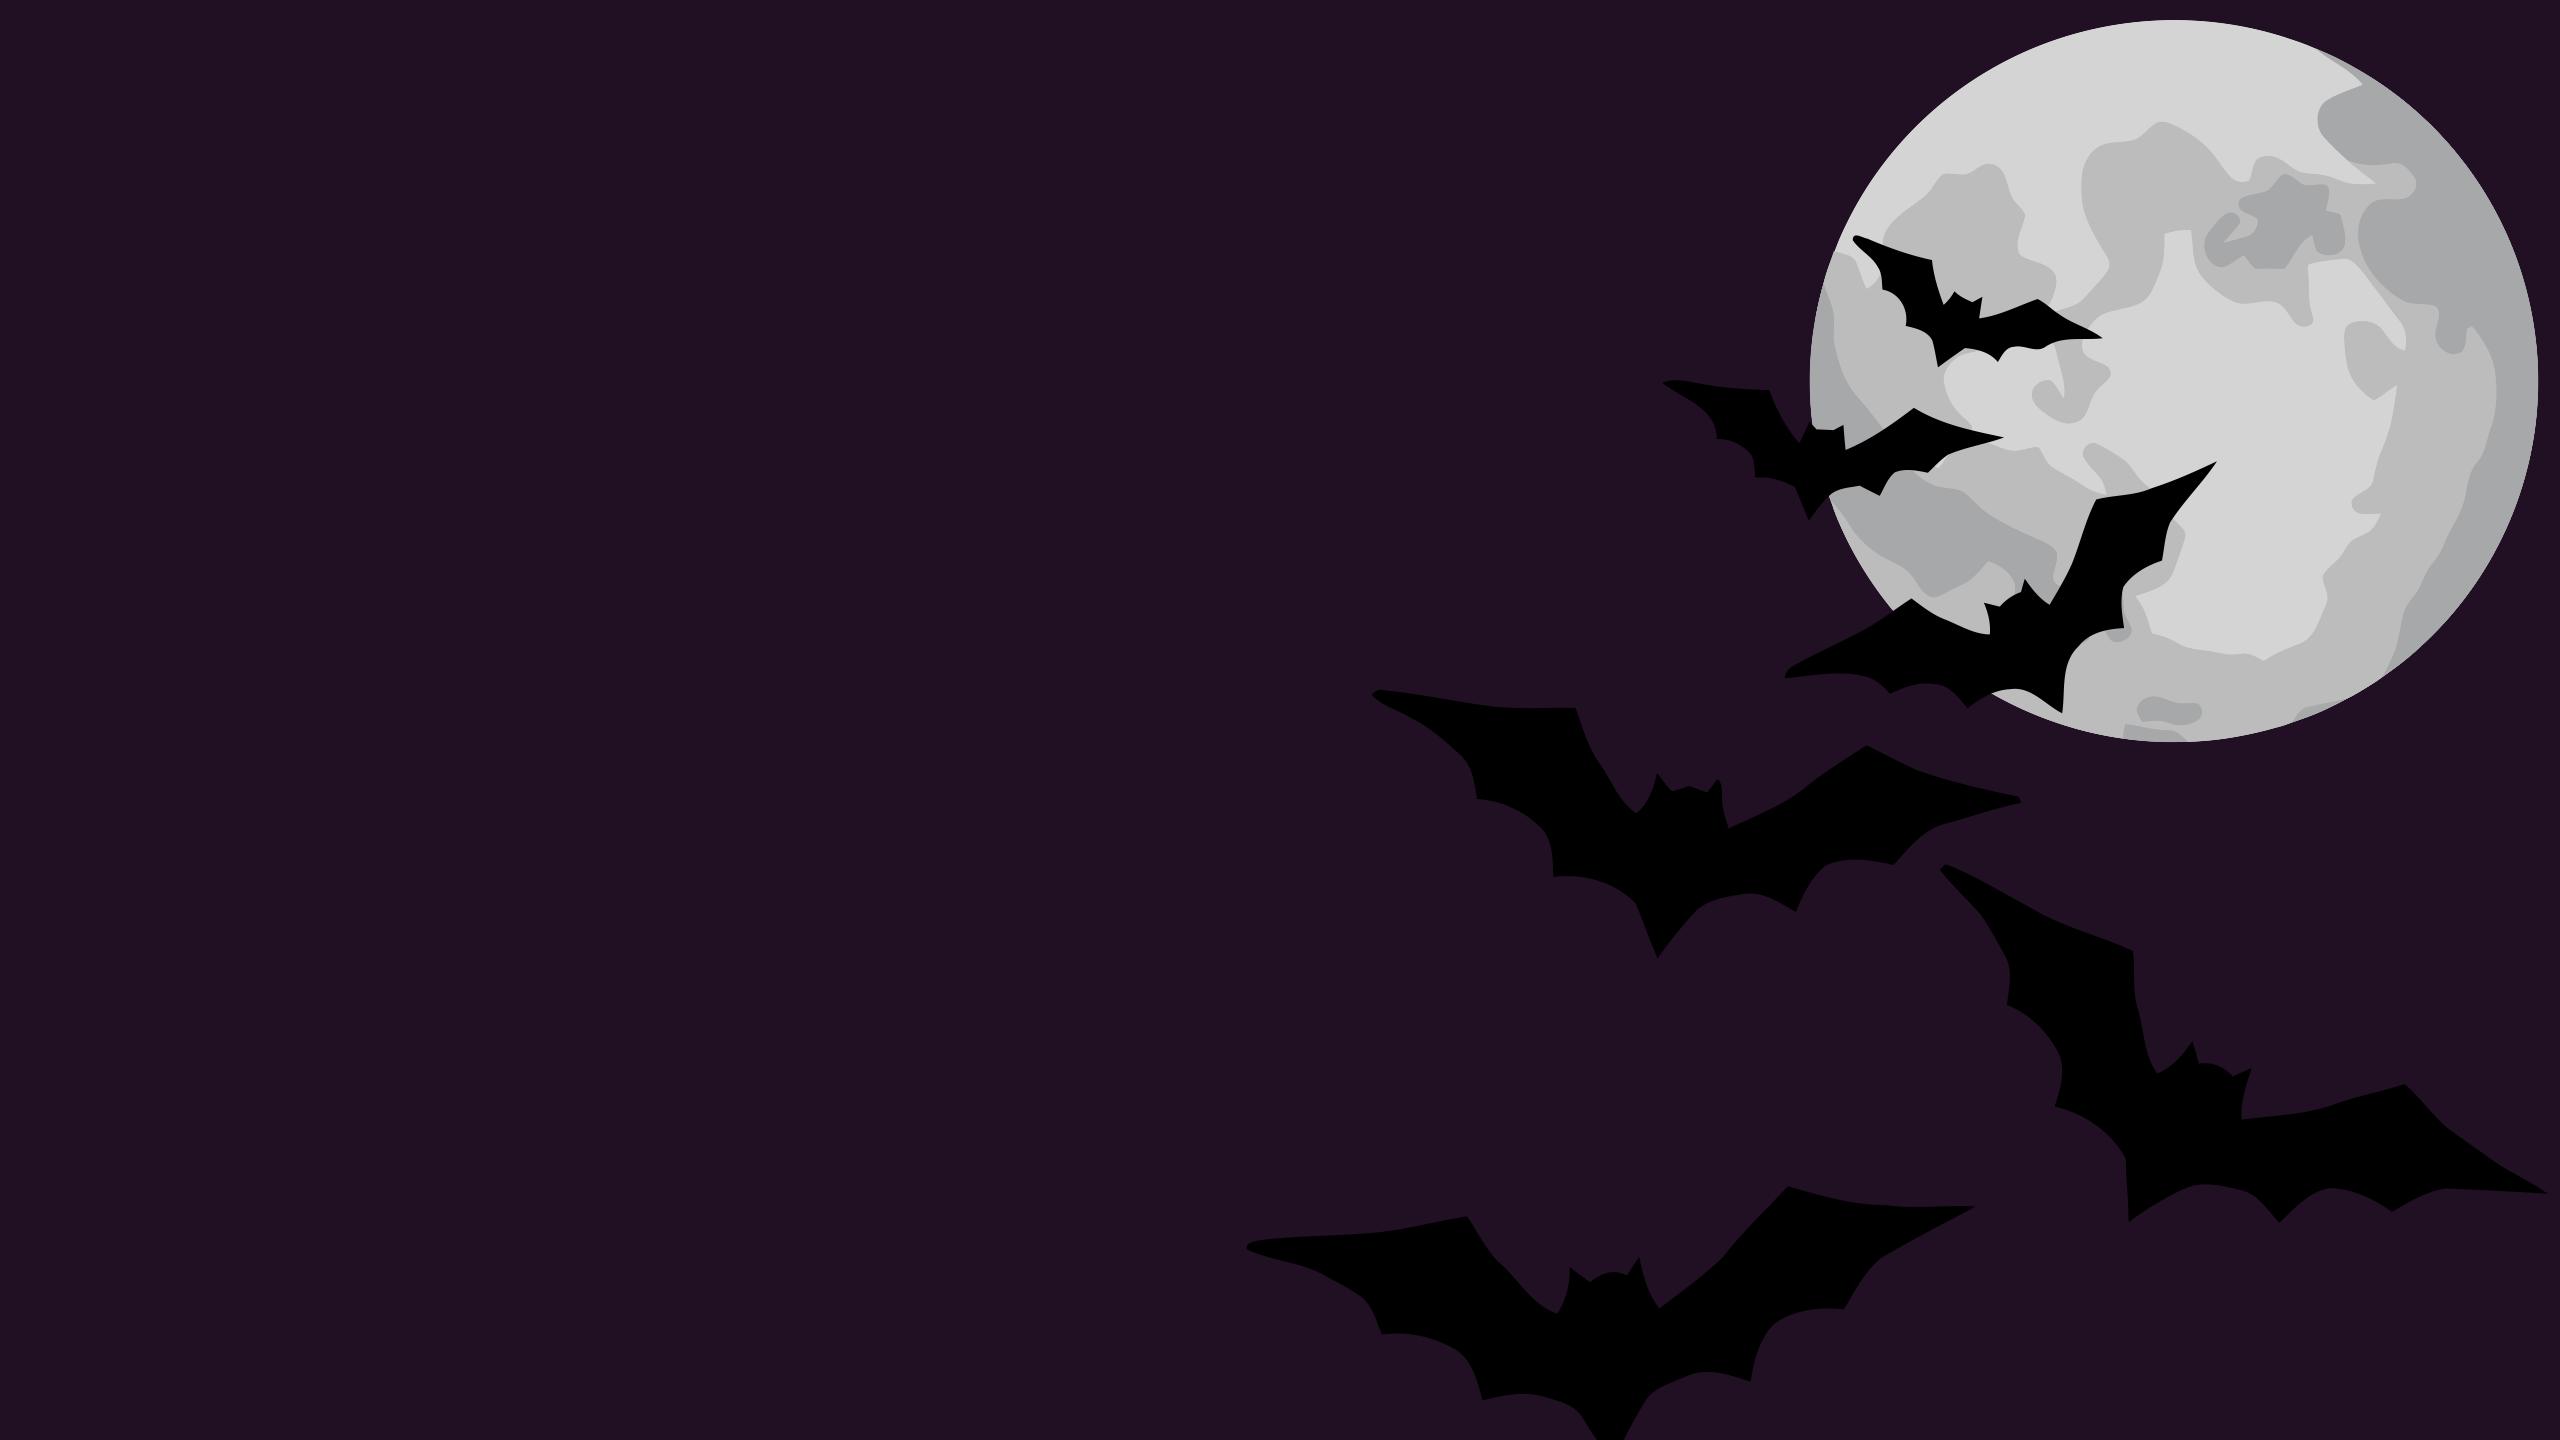 Amazing Wallpaper Halloween Purple - simple_halloween_wallpaper_by_damoxy-daieczl  Snapshot_14367.png